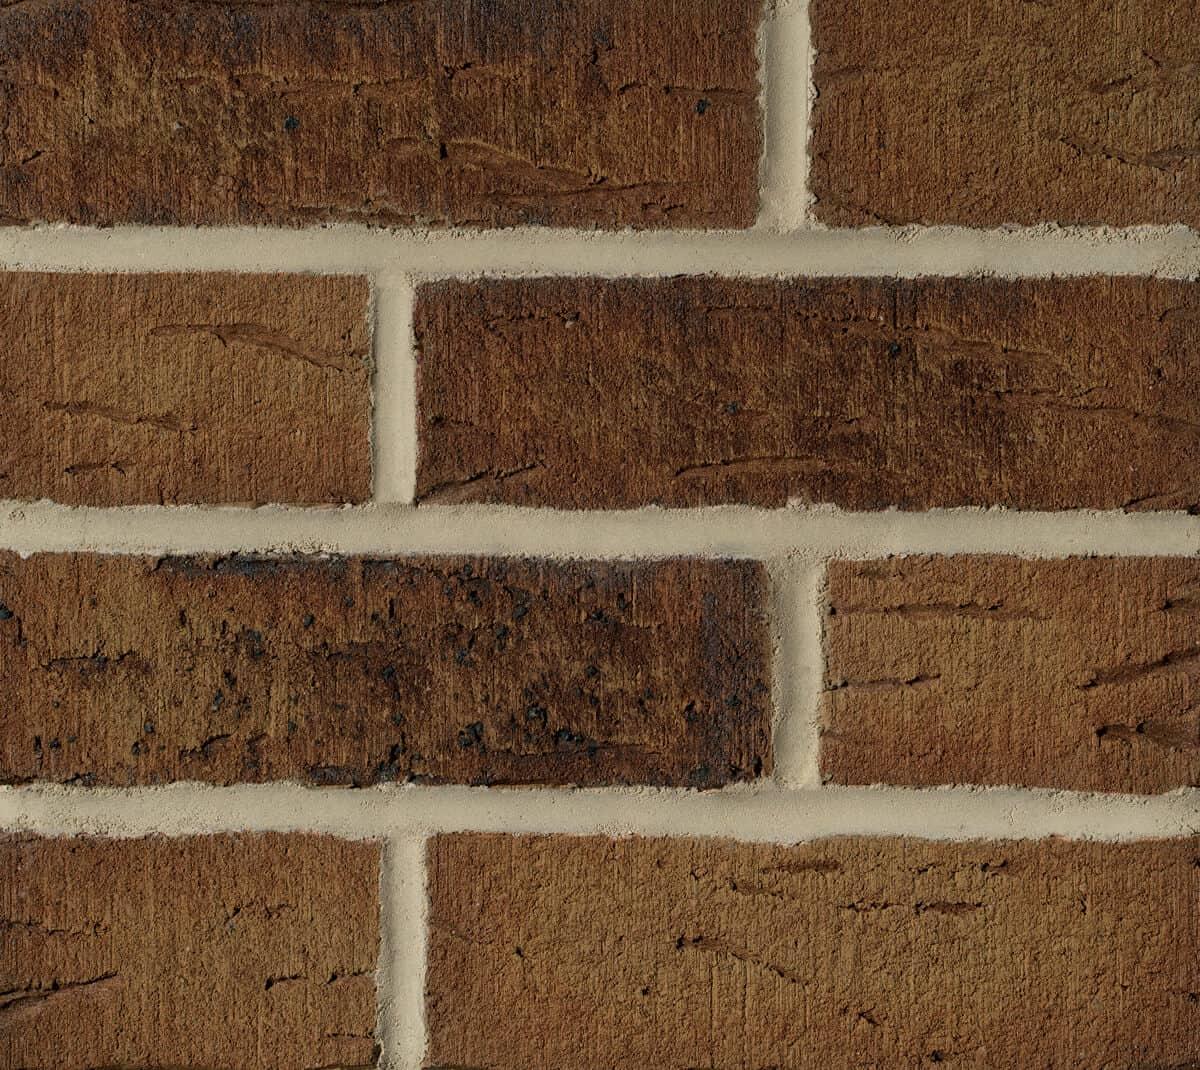 Rustic Golden Multi 684 Brick Slips